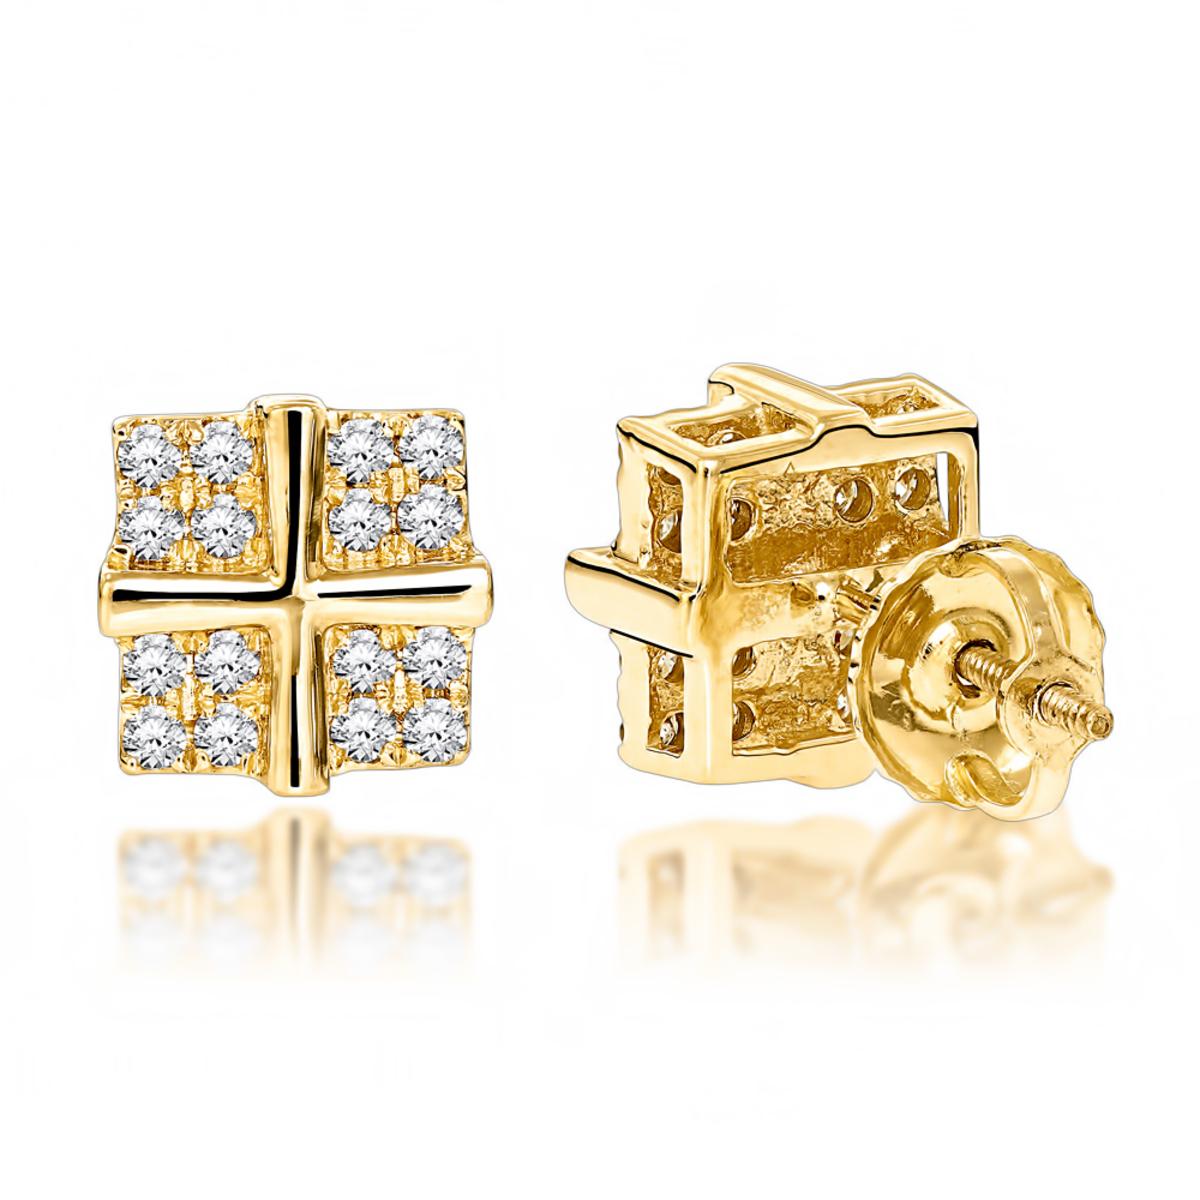 Round Diamond Stud Earrings 0.35ct 14K Gold